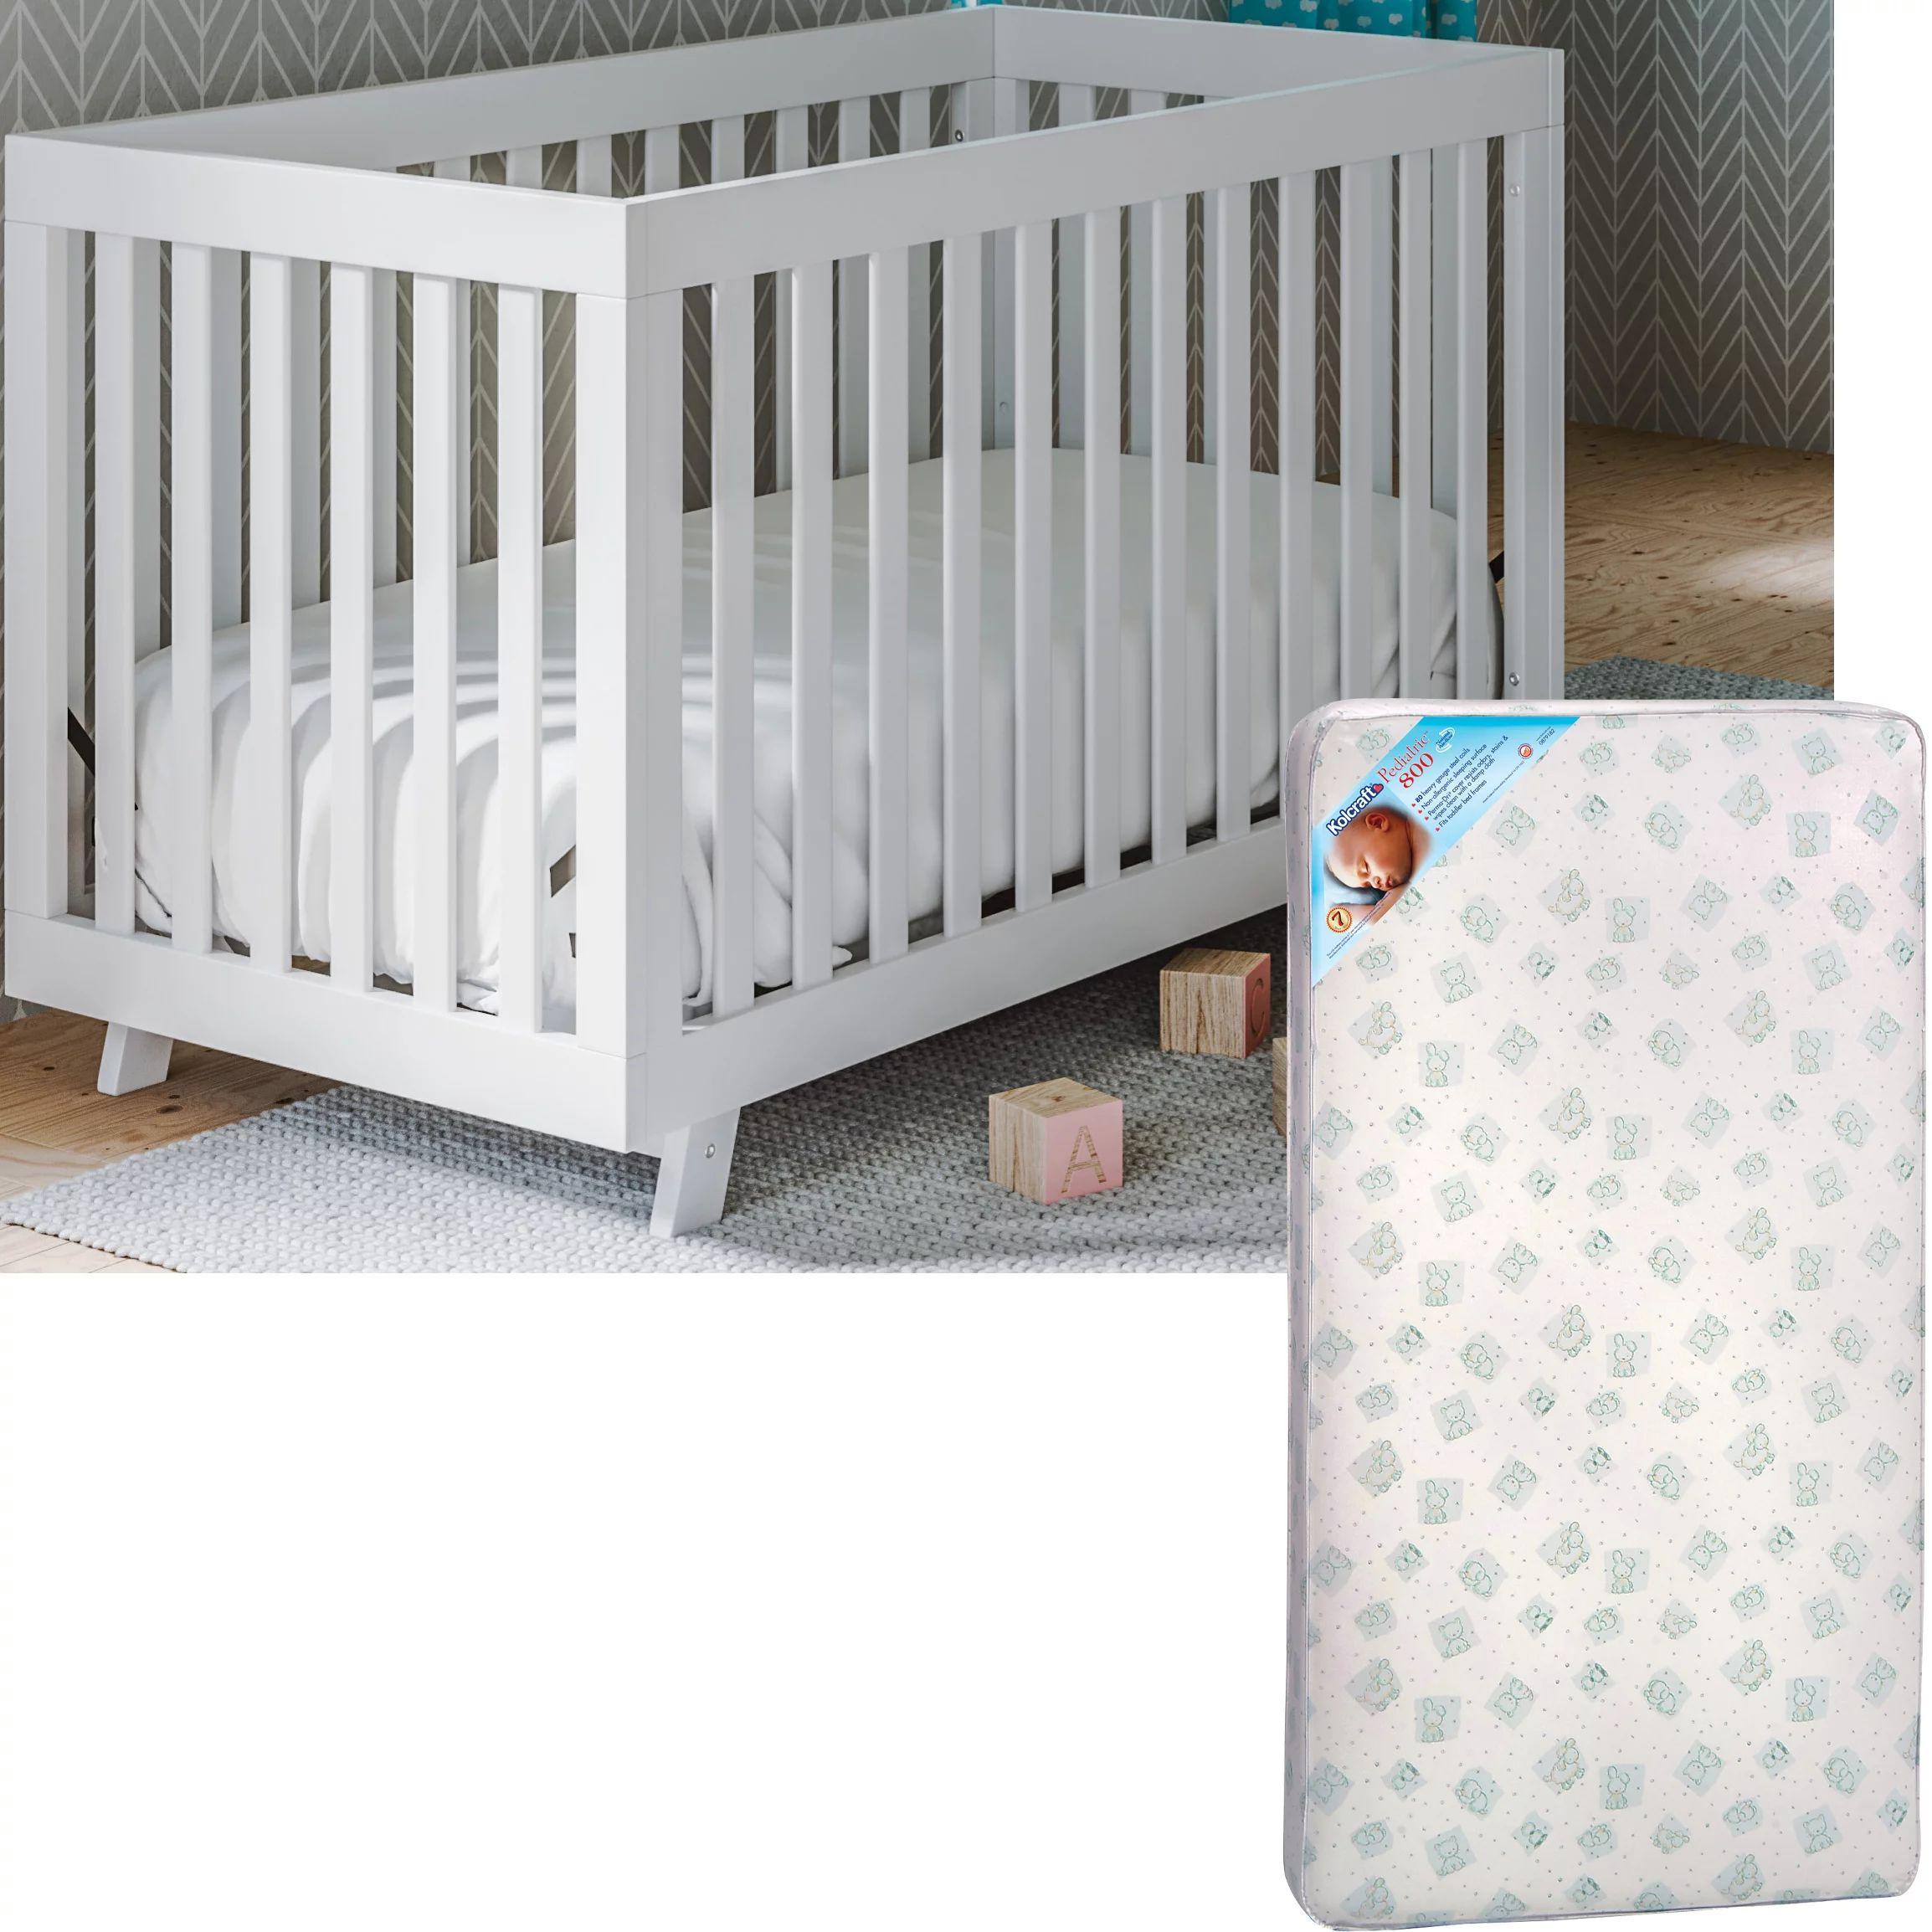 Crib for sale - Crib For Sale 12